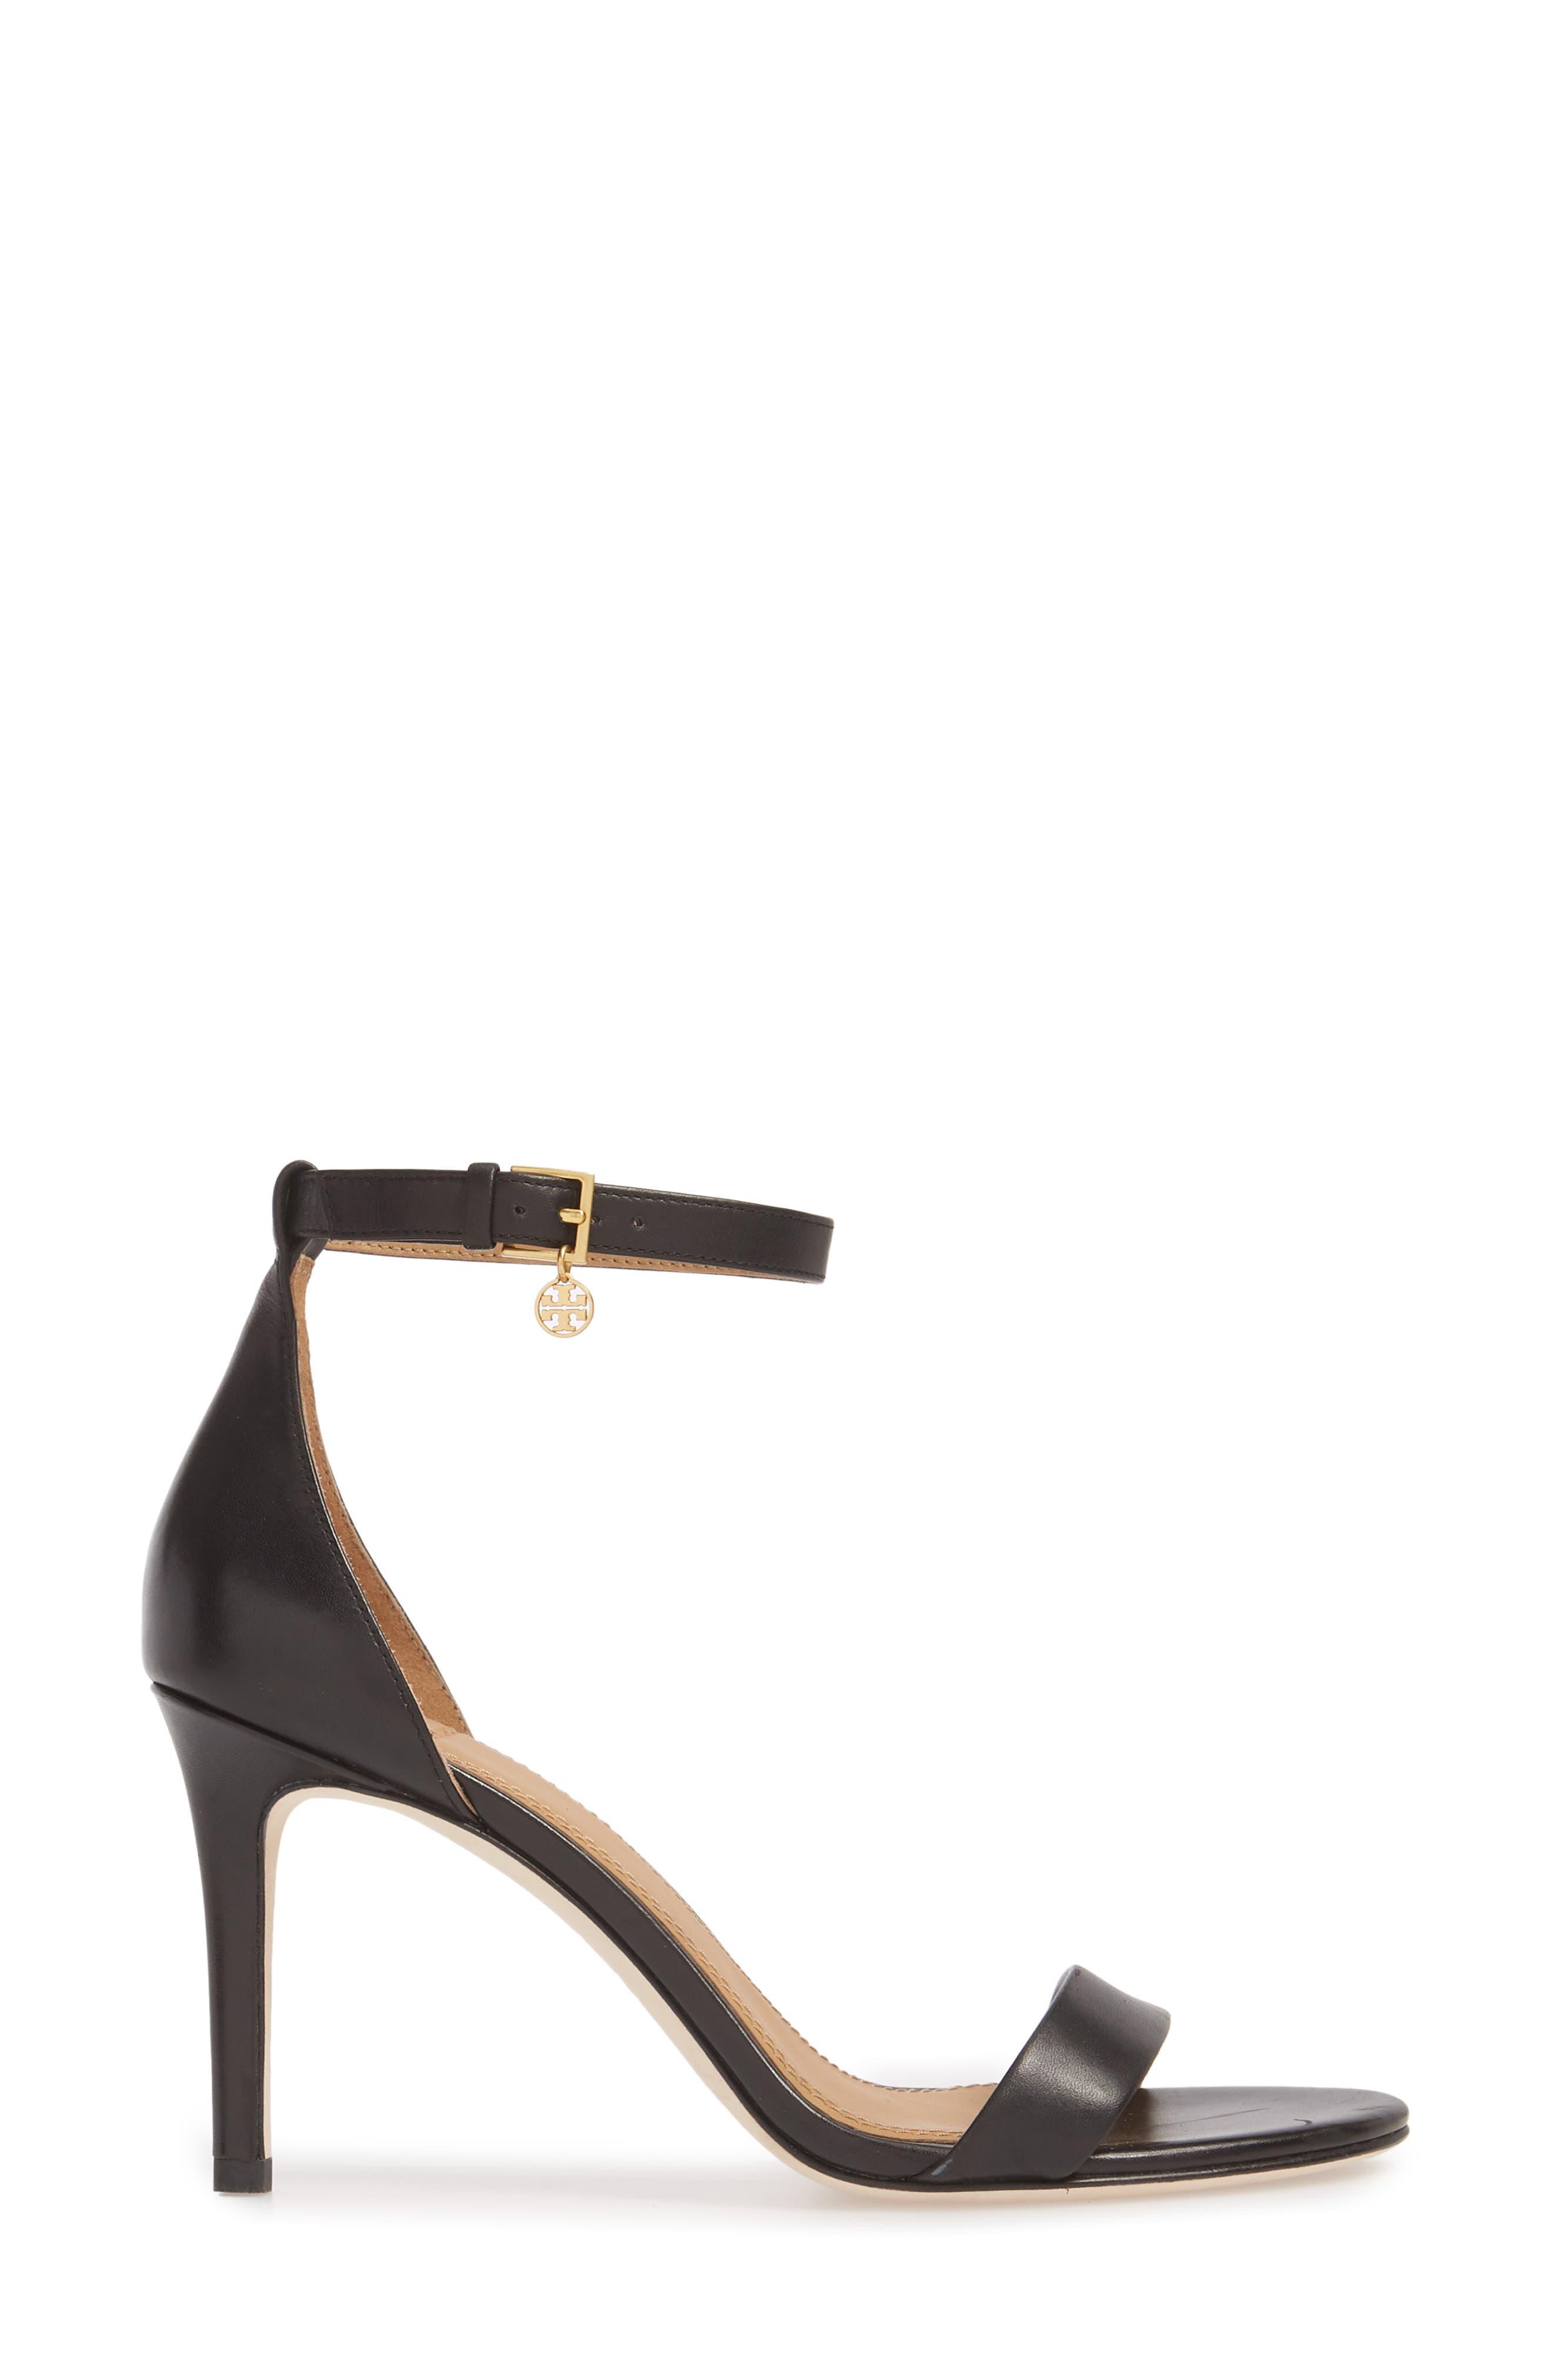 Ellie Ankle Strap Sandal,                             Alternate thumbnail 3, color,                             Black Leather